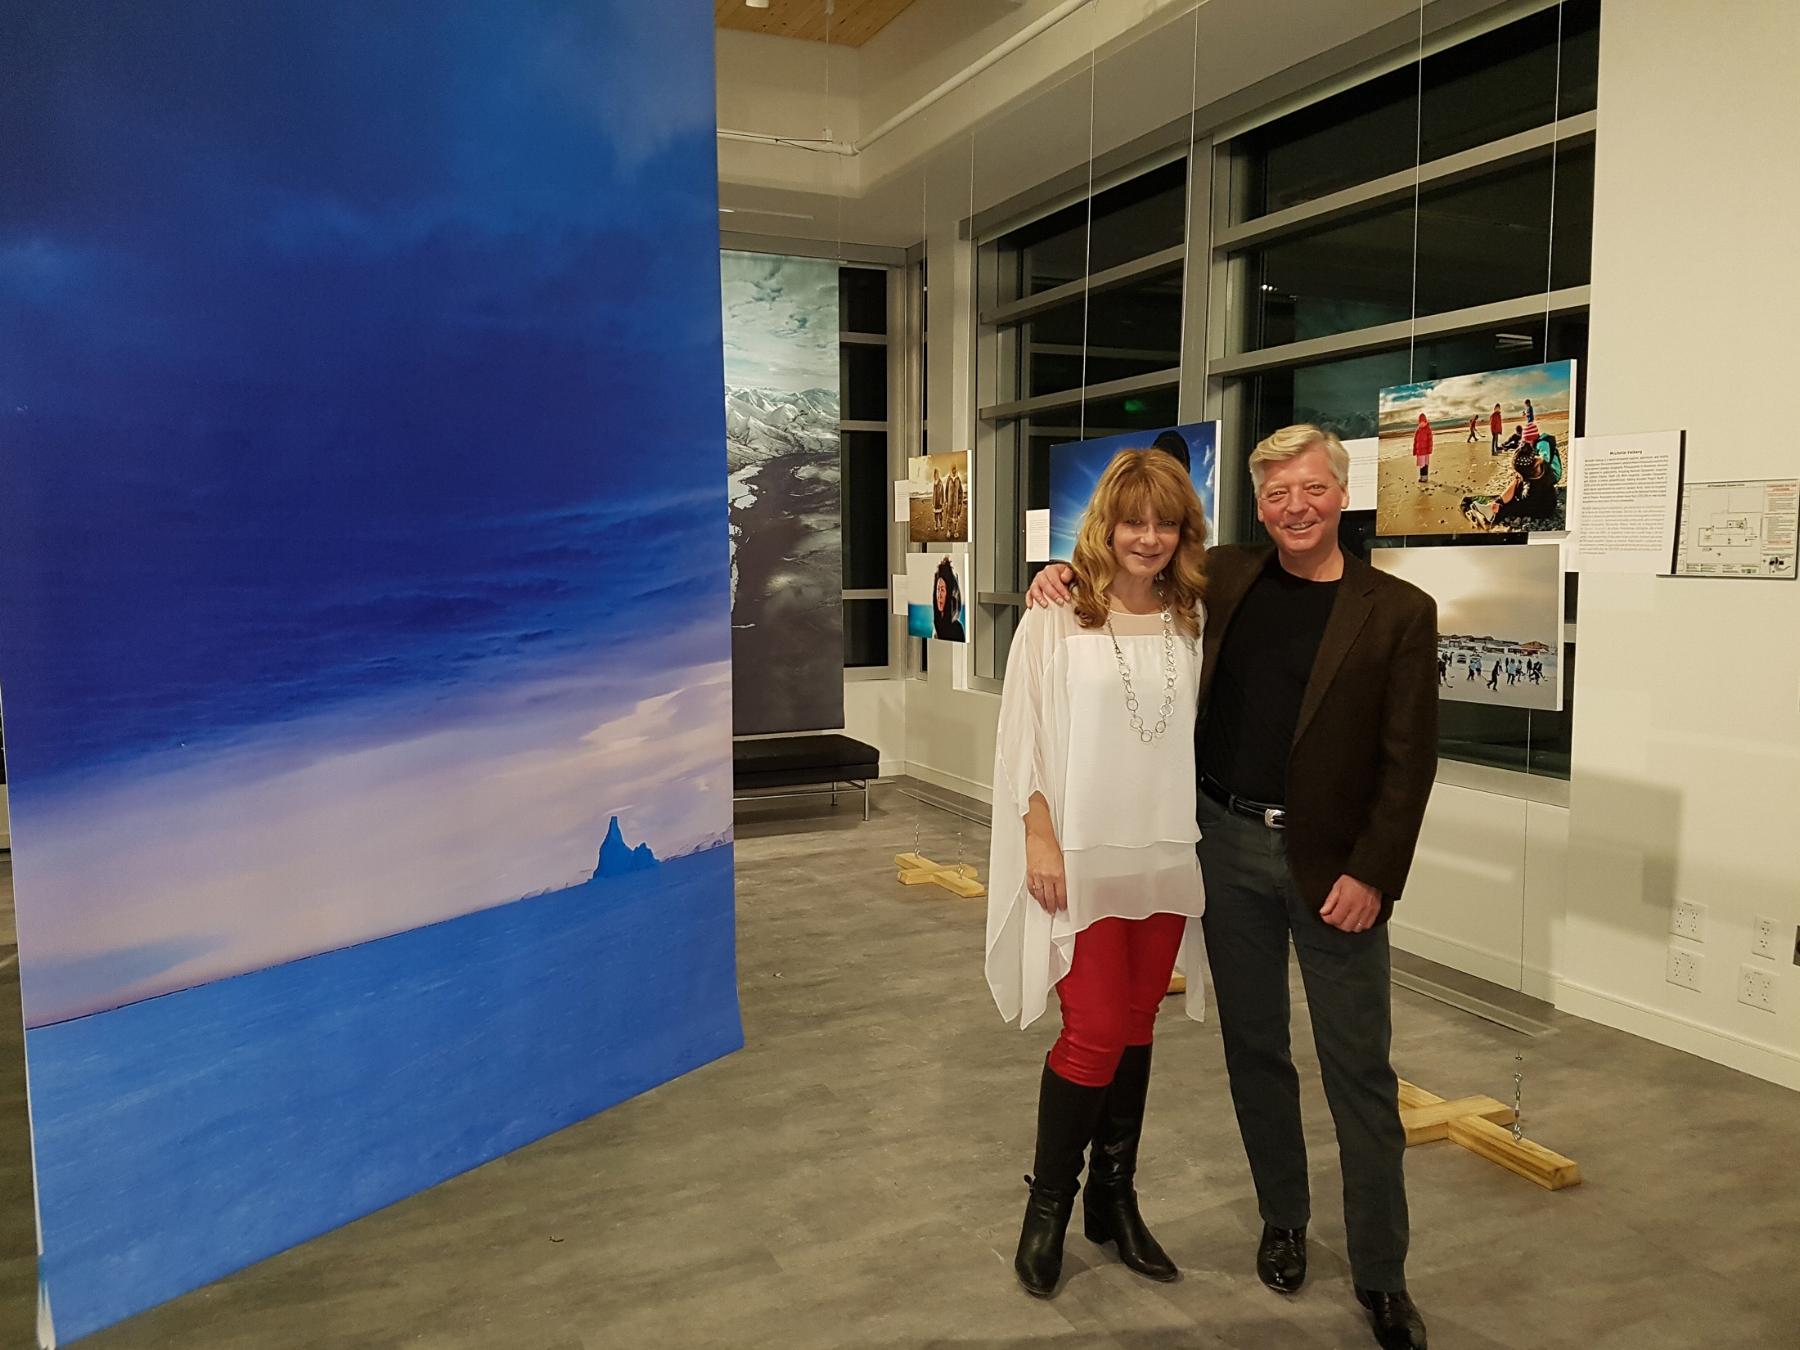 Canadian Arctic photographer Michelle Valberg and American Arctic photographer Stephen Gorman in front of some of Michelle's and Stephen's photographs.